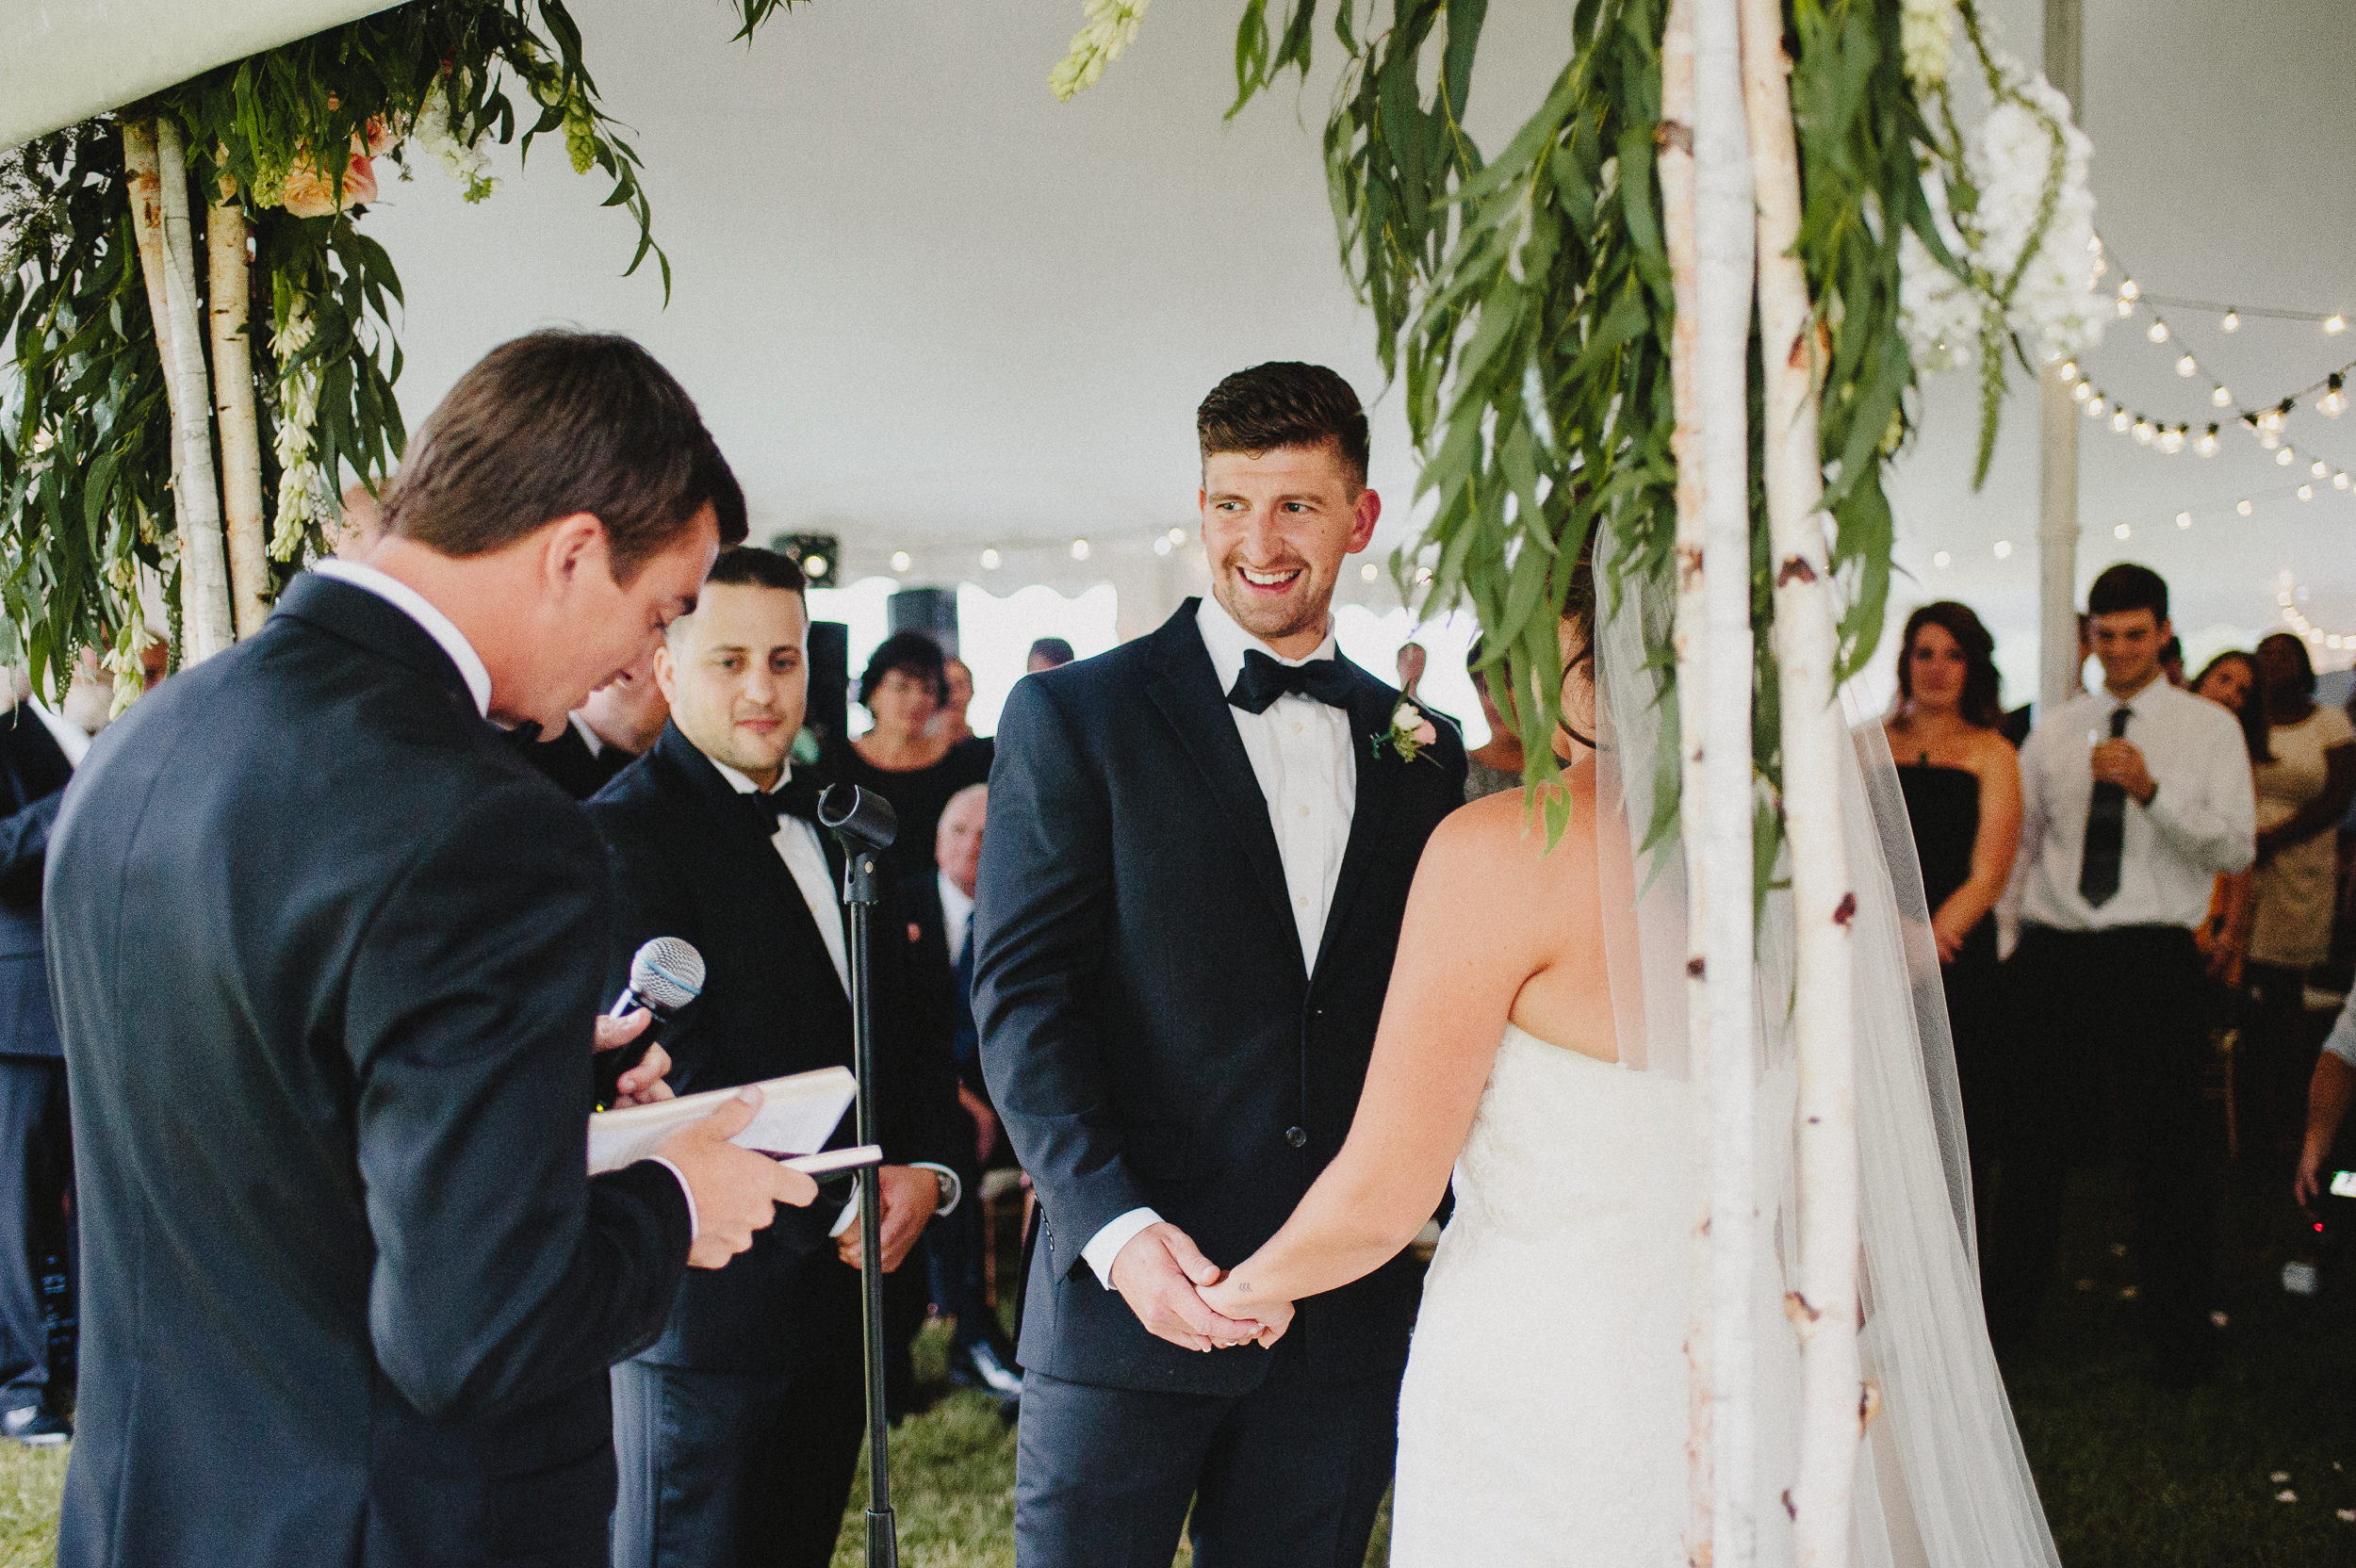 delaware-estate-wedding-photographer-pat-robinson-photography-91.jpg